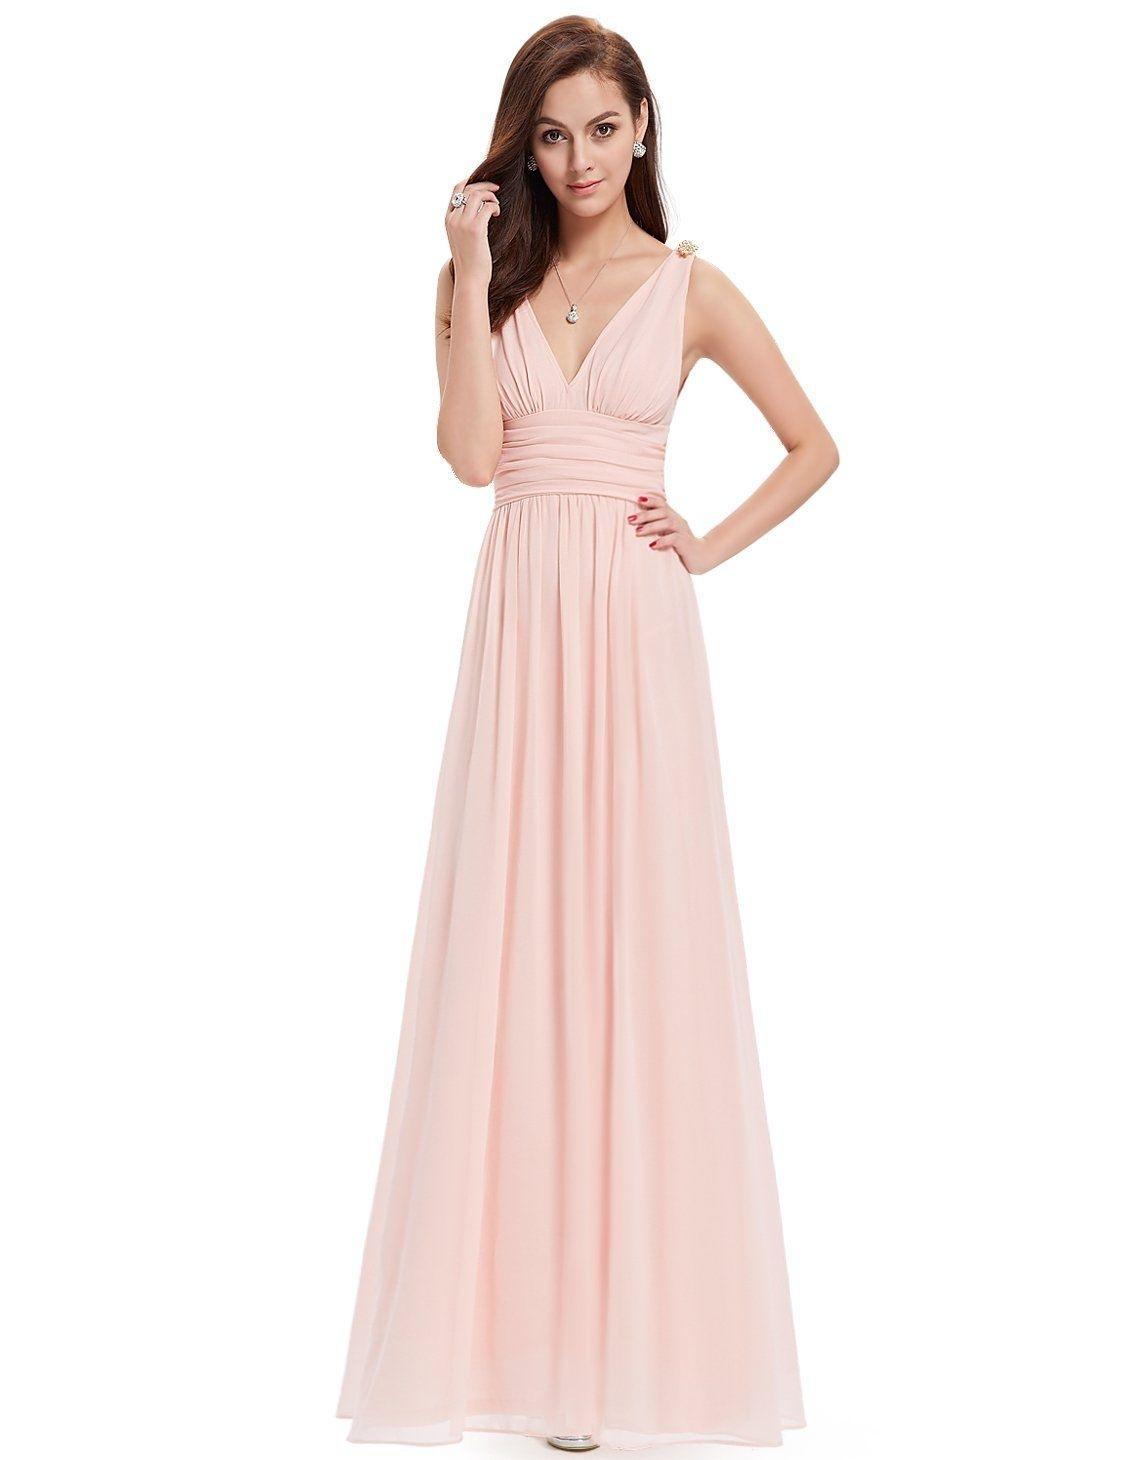 15 Großartig Damen Abendkleider Lang Günstig ÄrmelDesigner Luxus Damen Abendkleider Lang Günstig Spezialgebiet